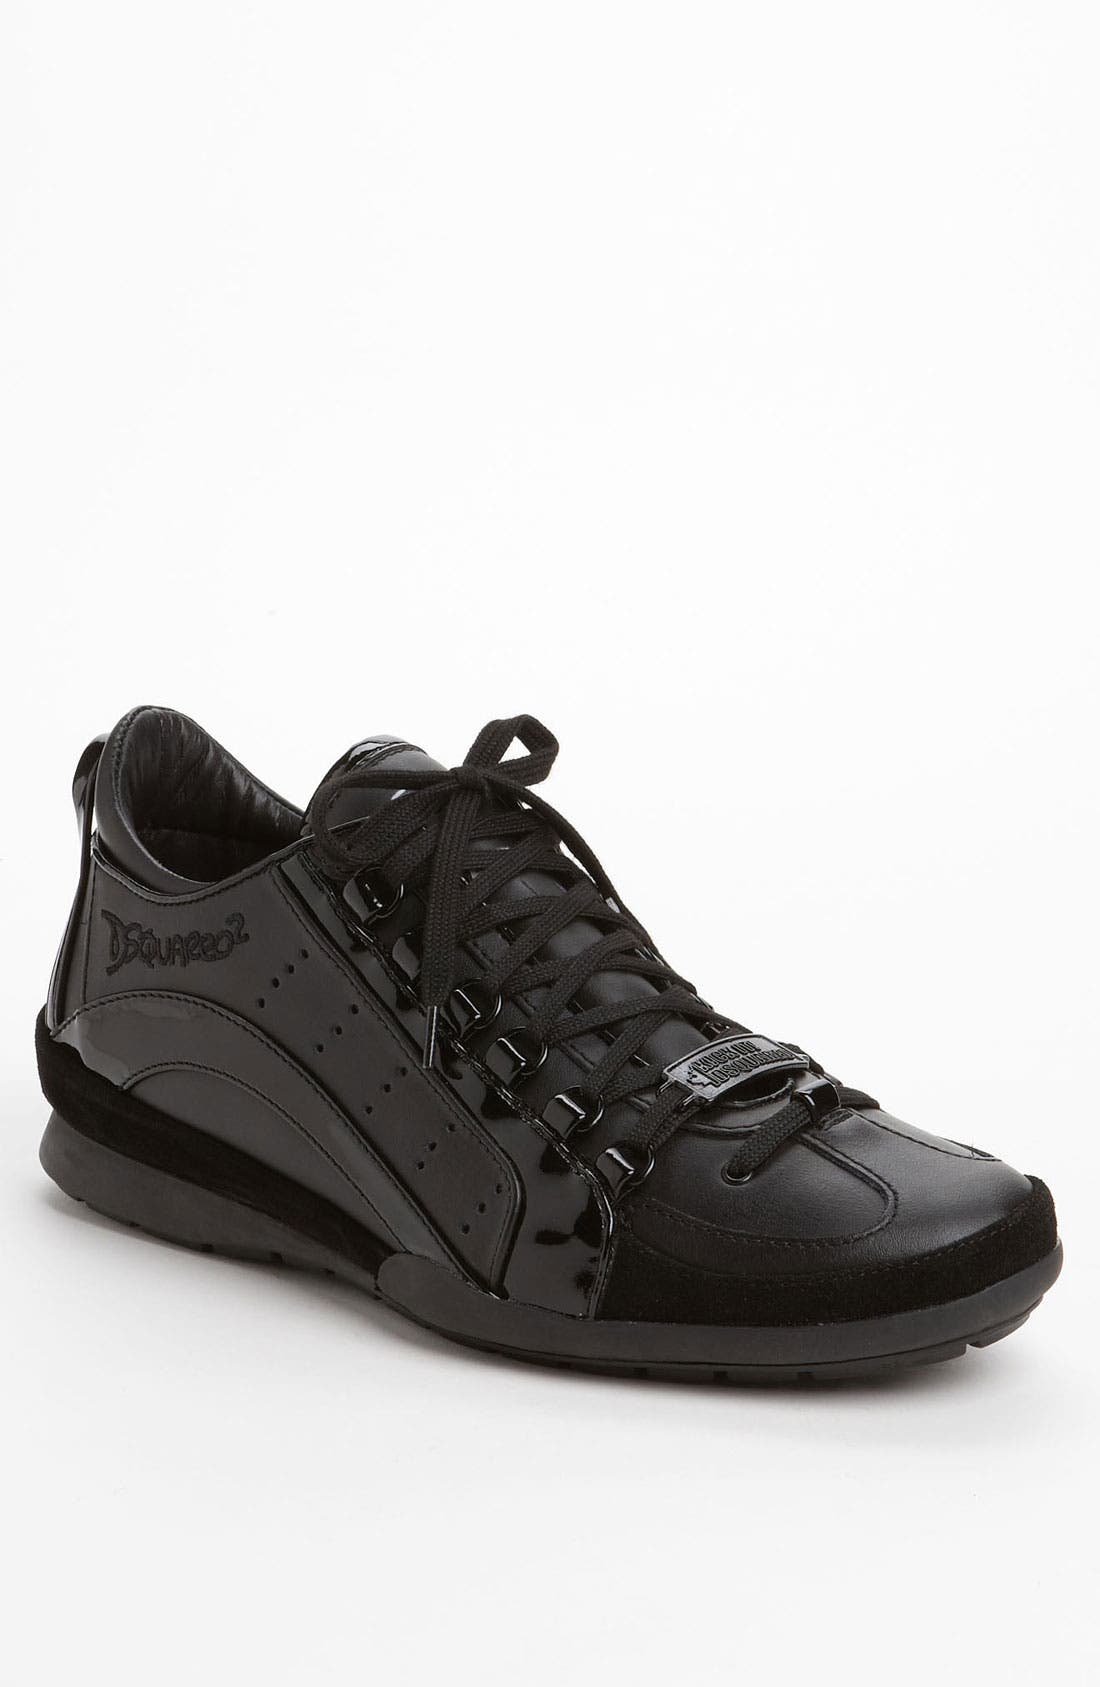 Main Image - Dsquared2 '551' Sport Sneaker